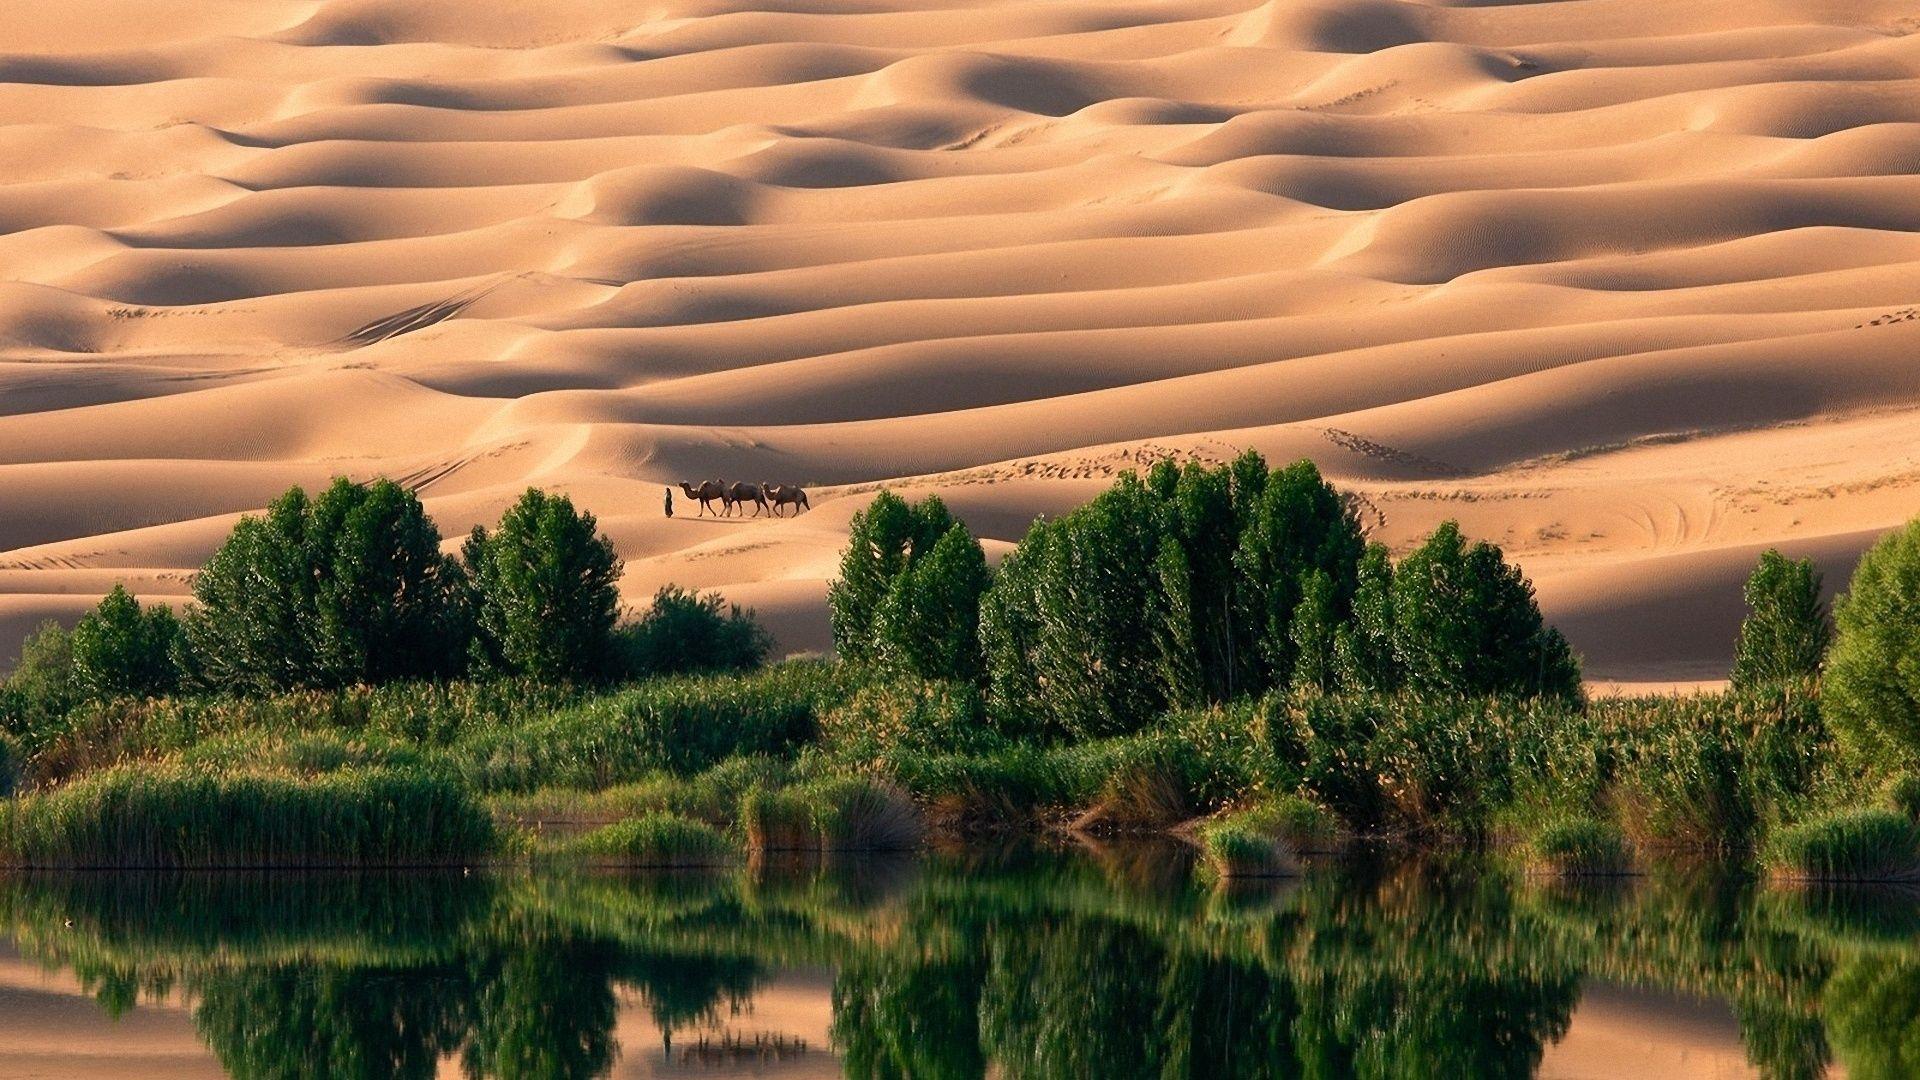 http://www.zastavki.com/pictures/originals/2014/Nature___Desert_Oasis_in_the_desert_089469_.jpg